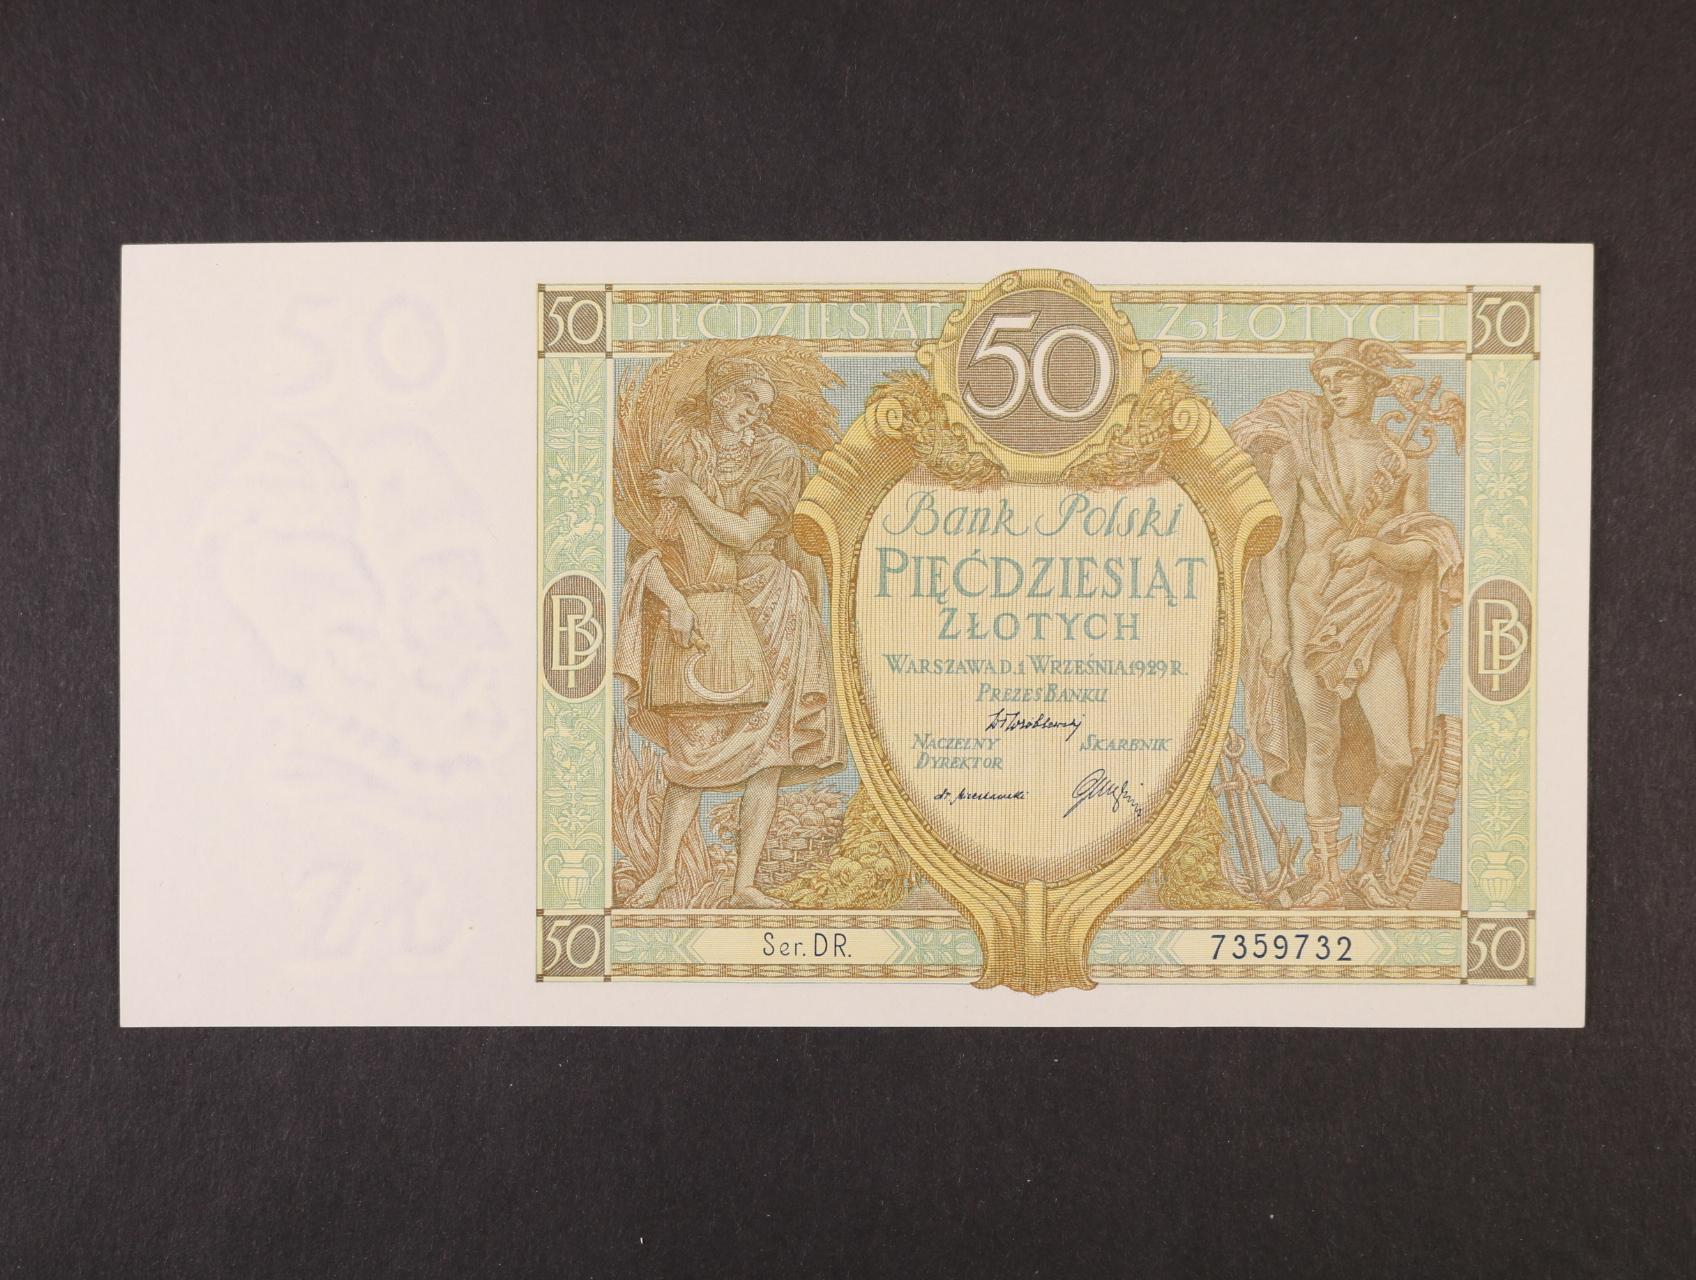 50 Zlotych 1.9.1929 série DR., platná na ČS území, Pi. 71, Ba. PL 9b